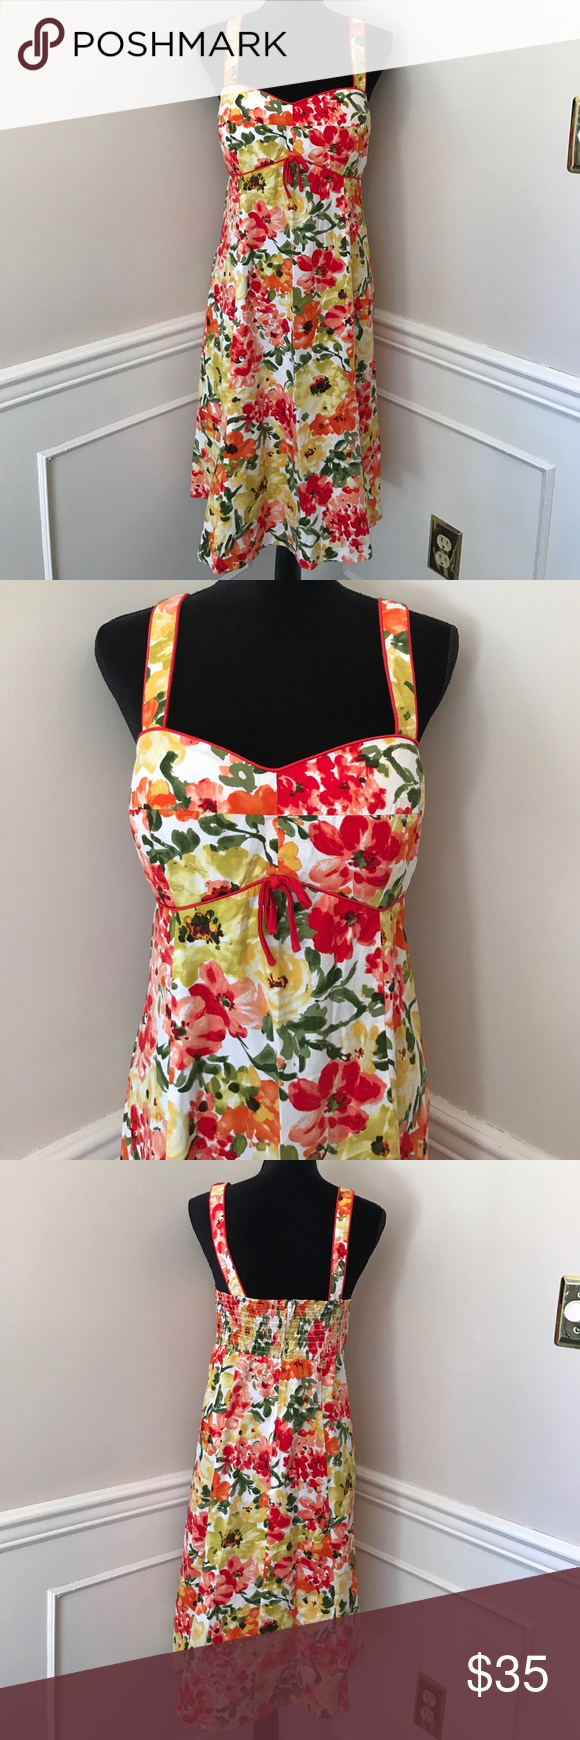 R K Original Women S Summer Dress Size 12 Gently Used R K Original Women S Dress Size 12 R And K Dresses Summer Dresses For Women Summer Dresses Summer Women [ 1740 x 580 Pixel ]